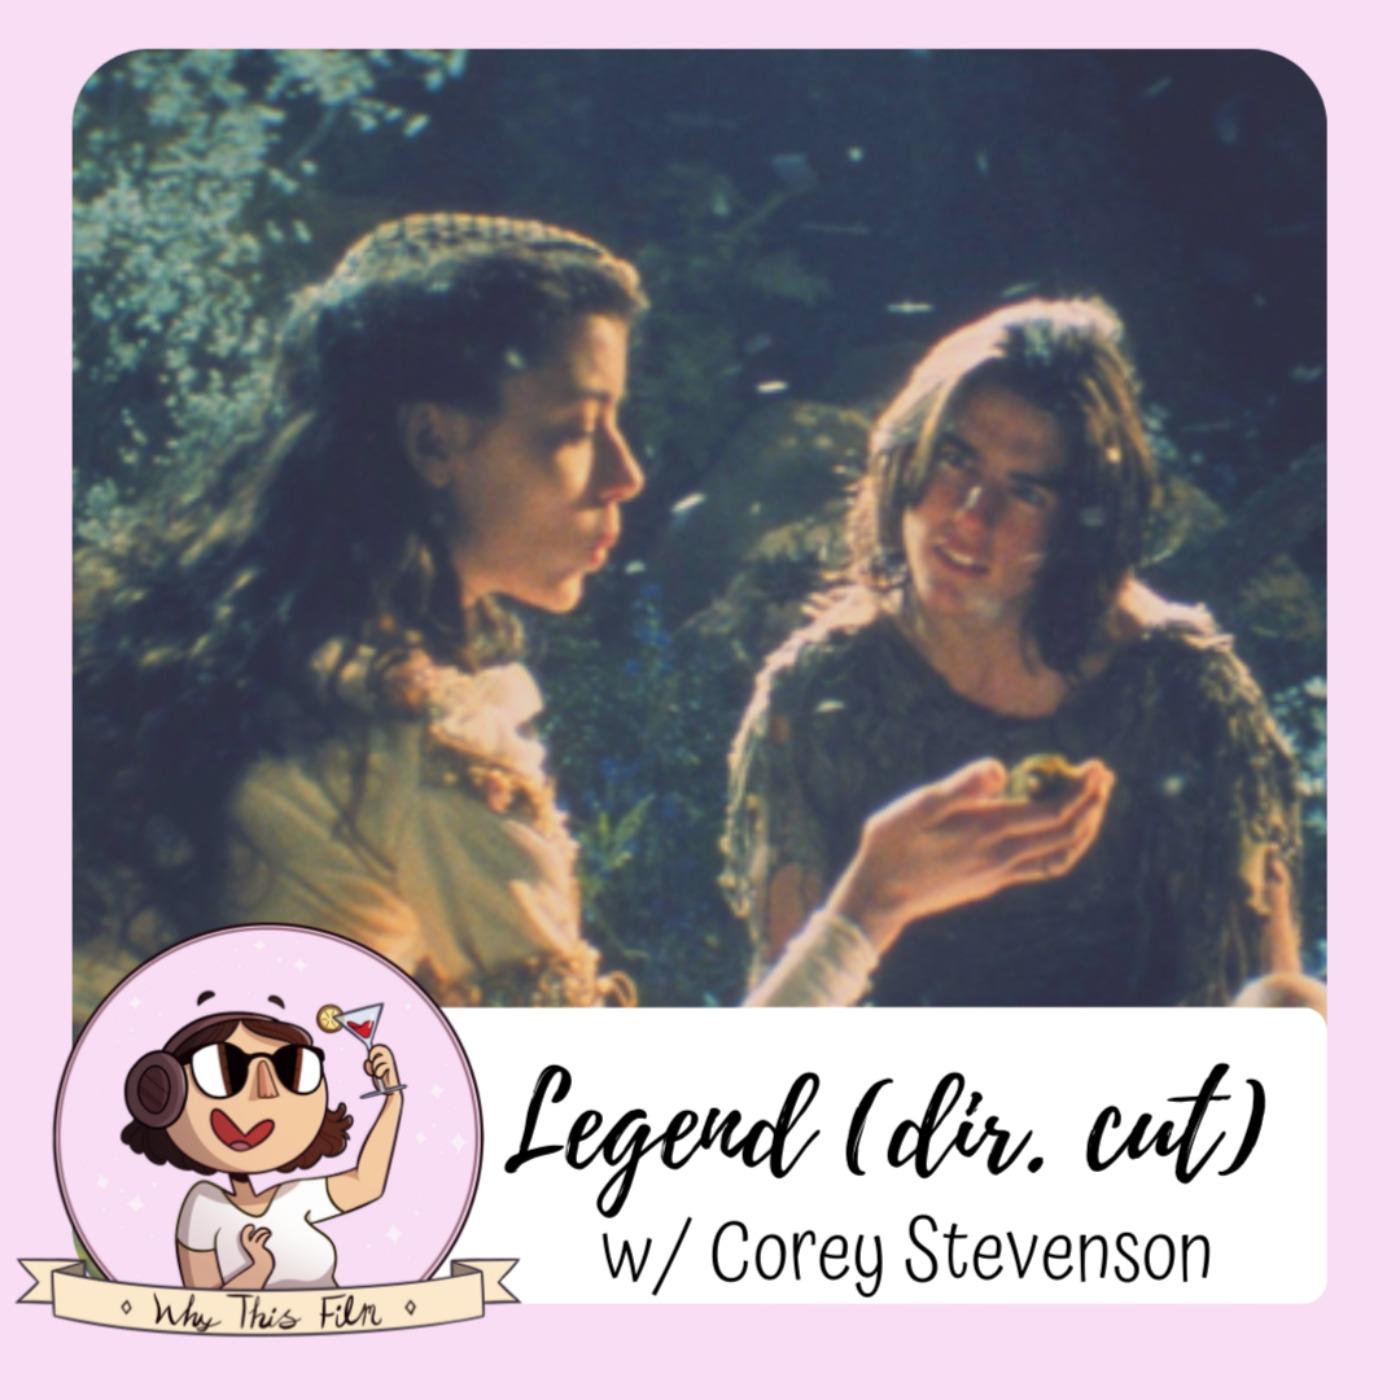 Legend The Director's Cut (w/Corey Stevenson)